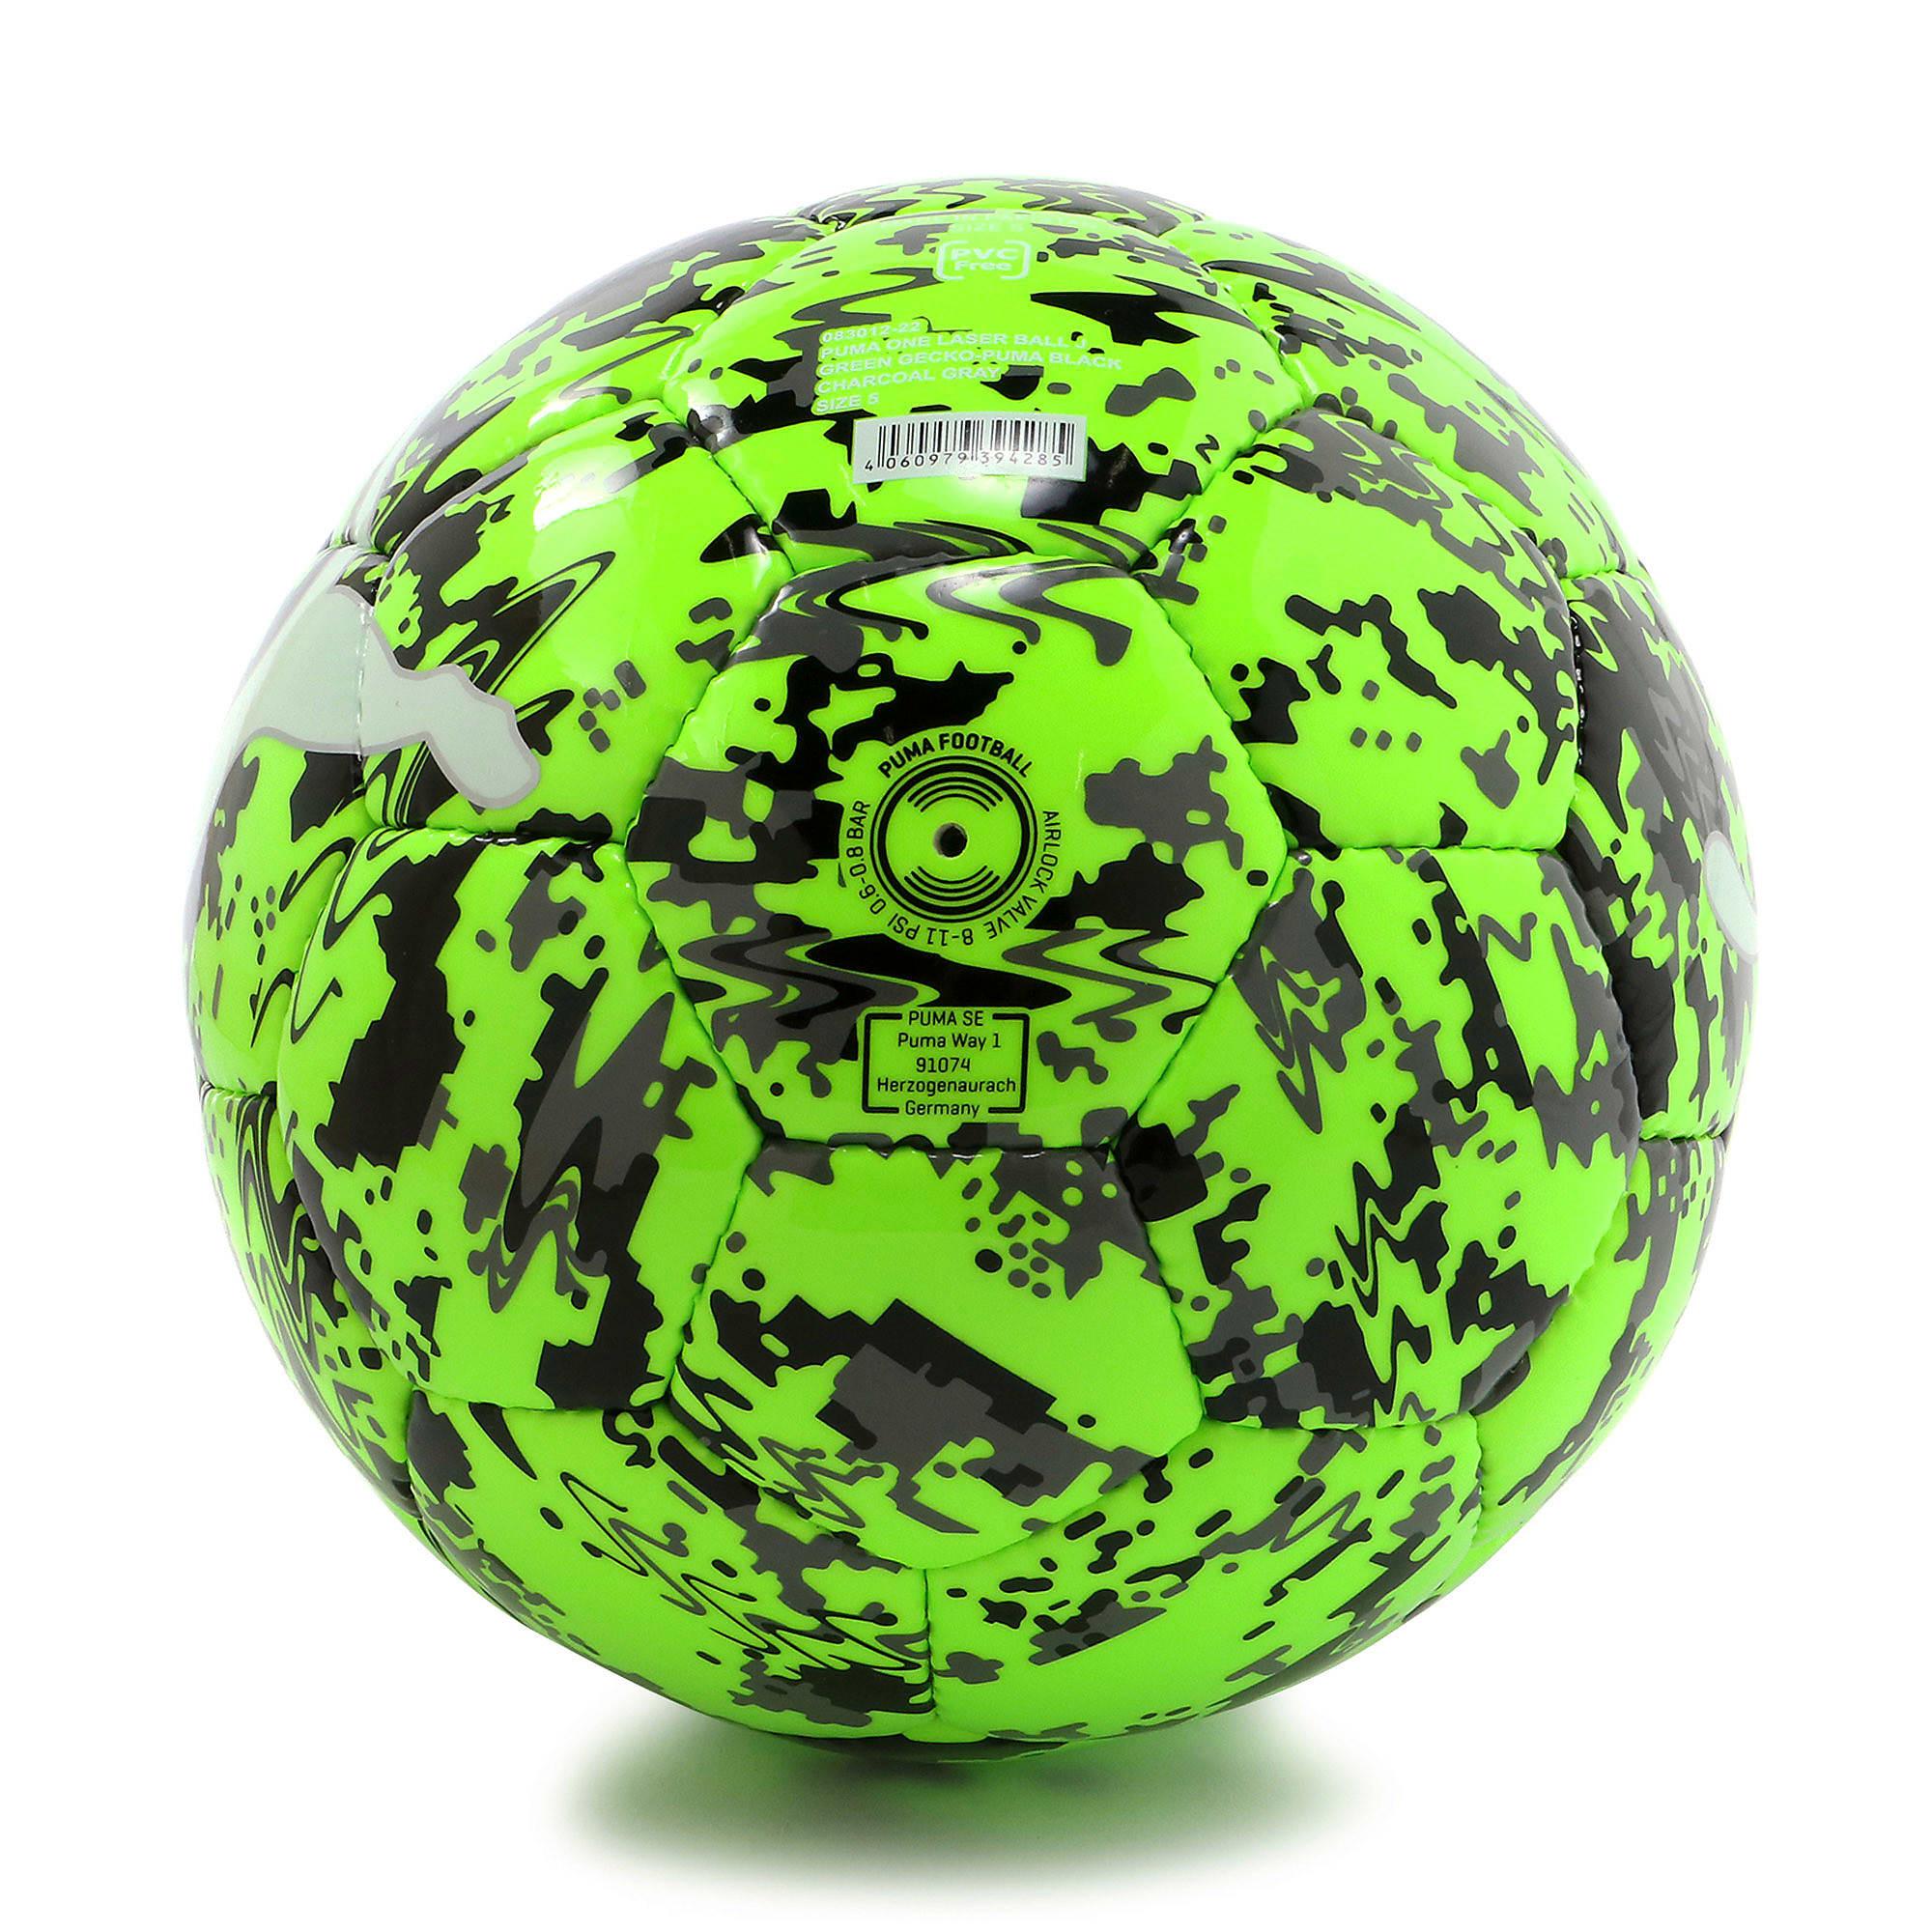 Thumbnail 2 of プーマ ワン レーザー サッカー ボール J, Green Gecko-Black-Gray, medium-JPN